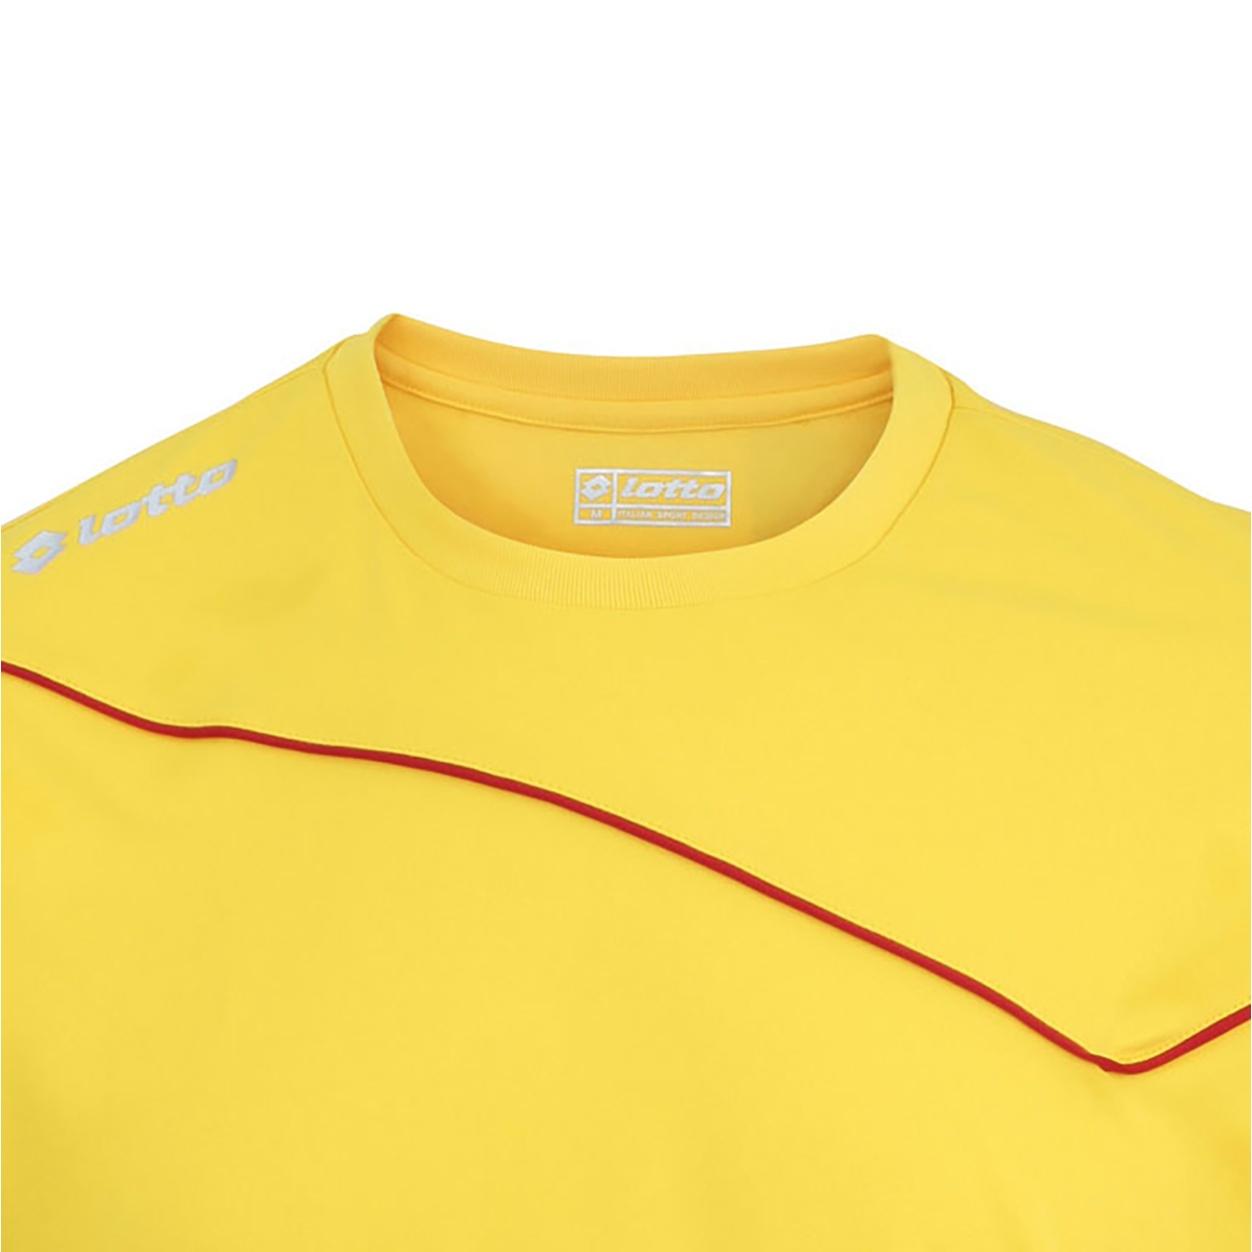 Lotto-Boys-Football-Sports-Kit-Long-Sleeve-Sigma-Full-Kit